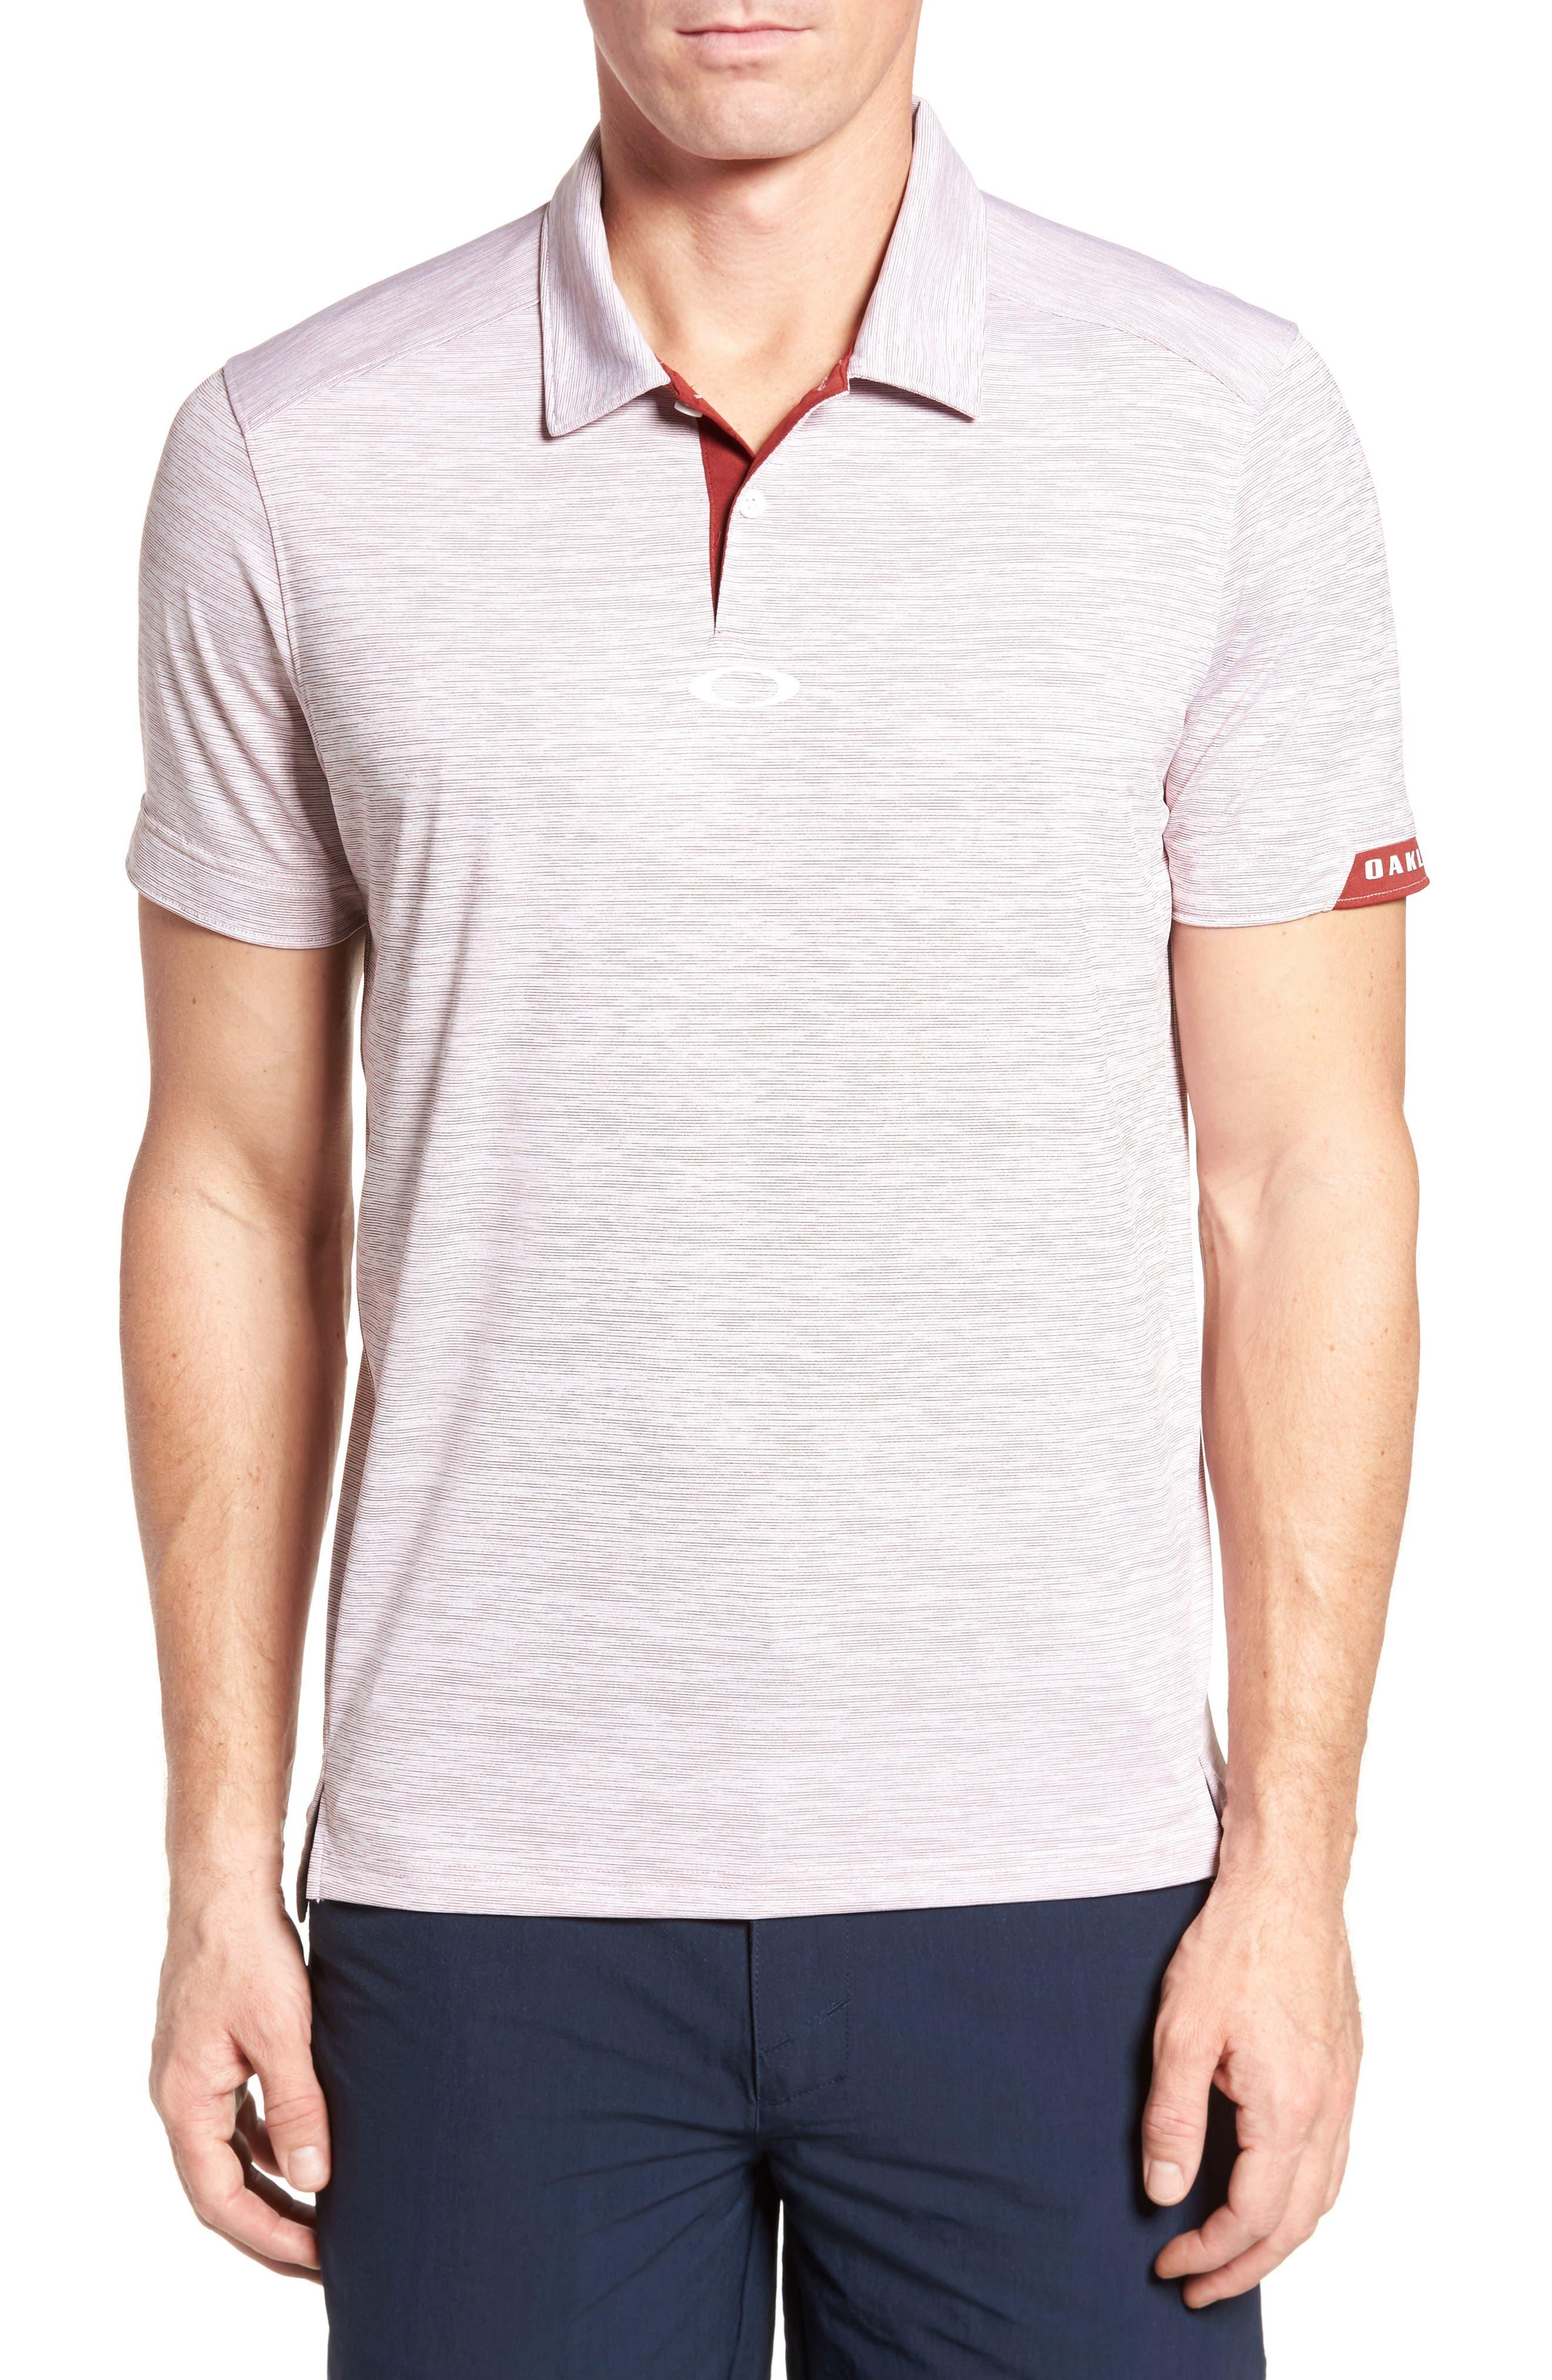 Alternate Image 1 Selected - Oakley Gravity Polo Shirt